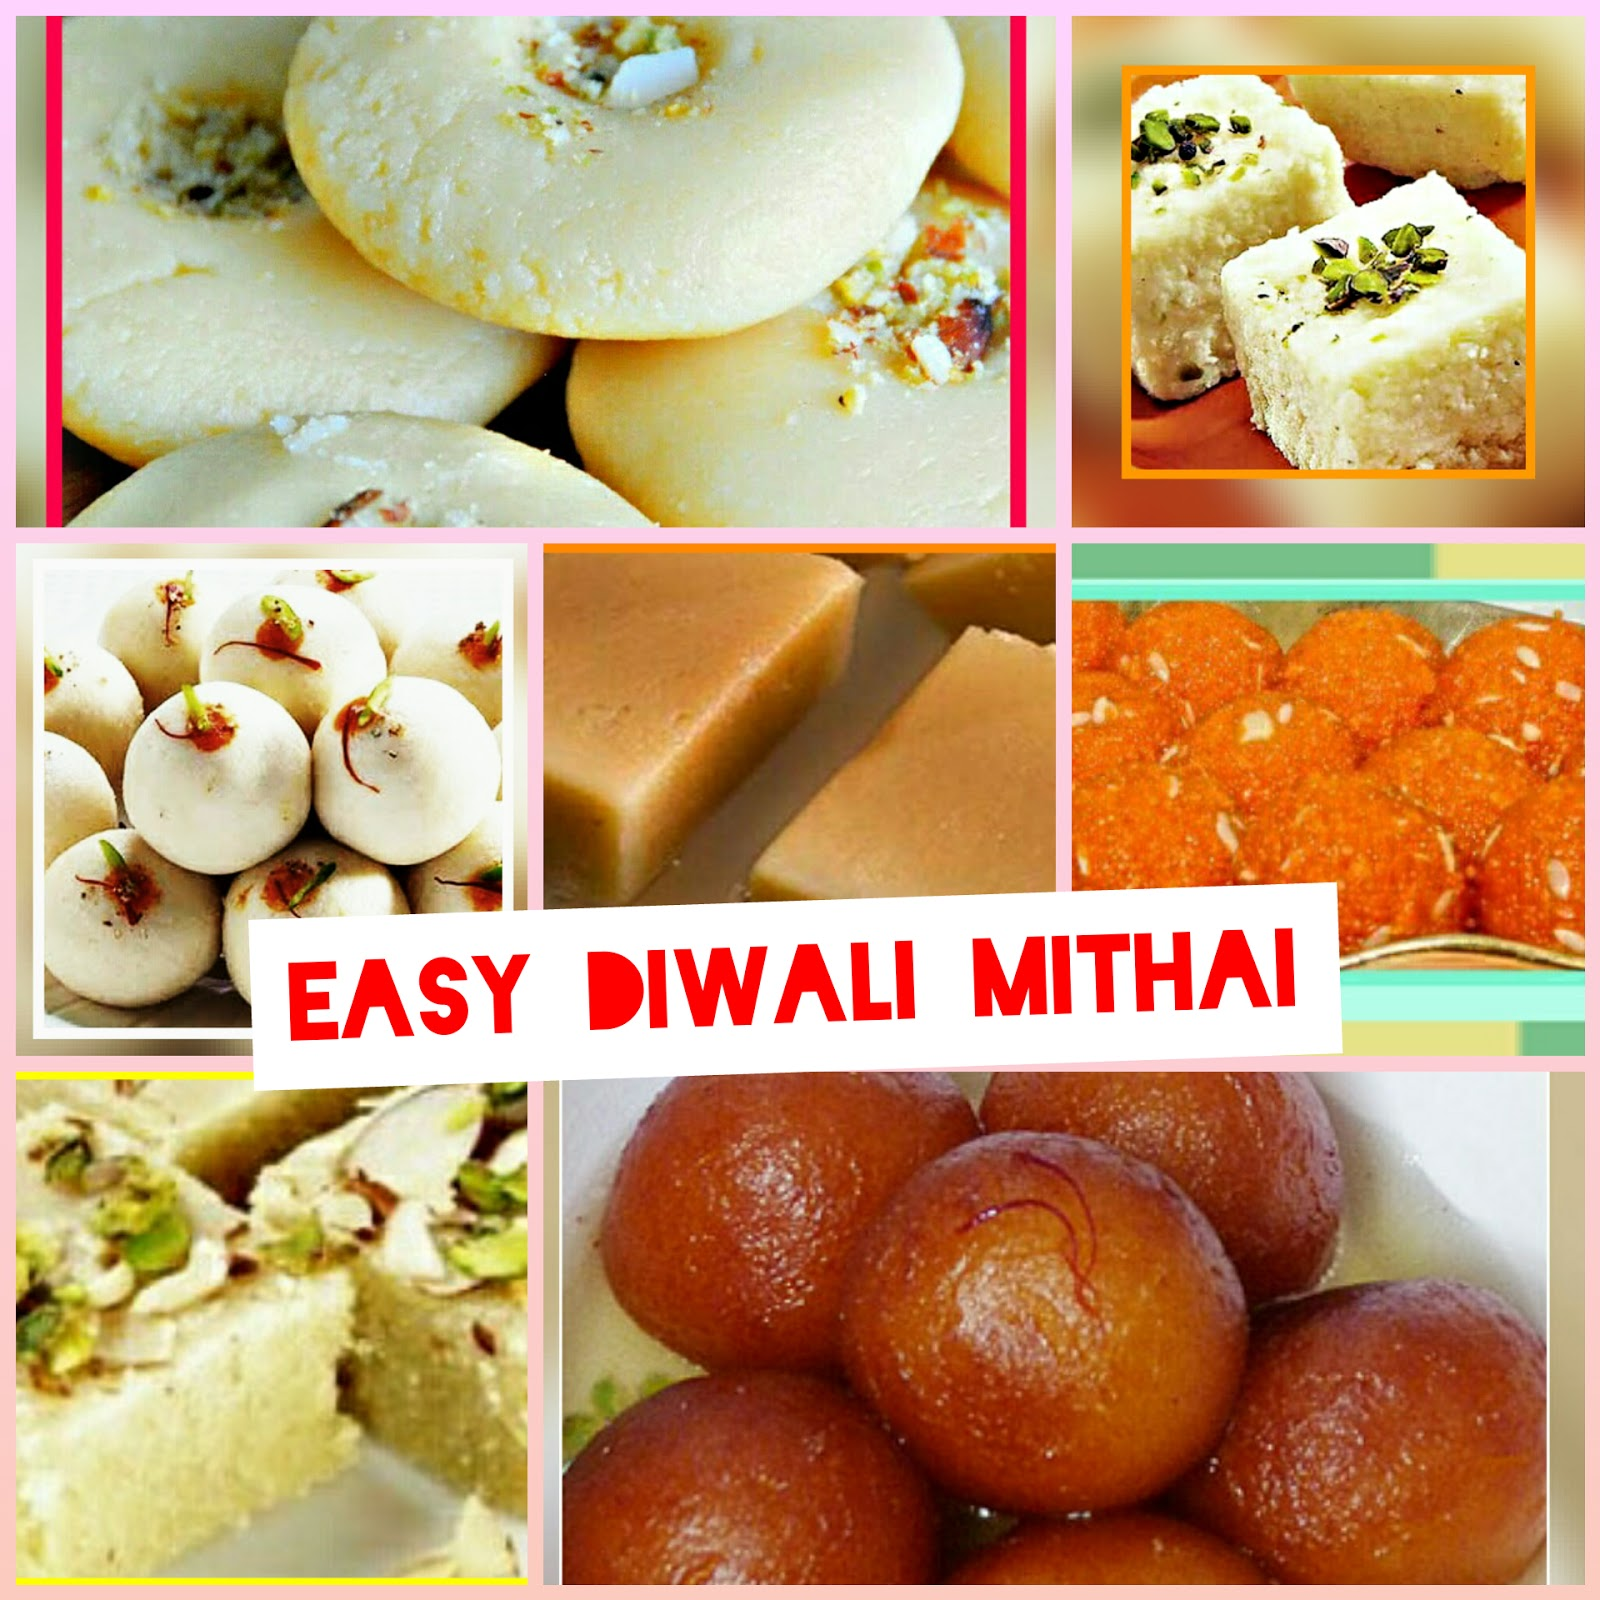 Easy Diwali Mithai - 99Advice for Deepavali Celebration Food  143gtk